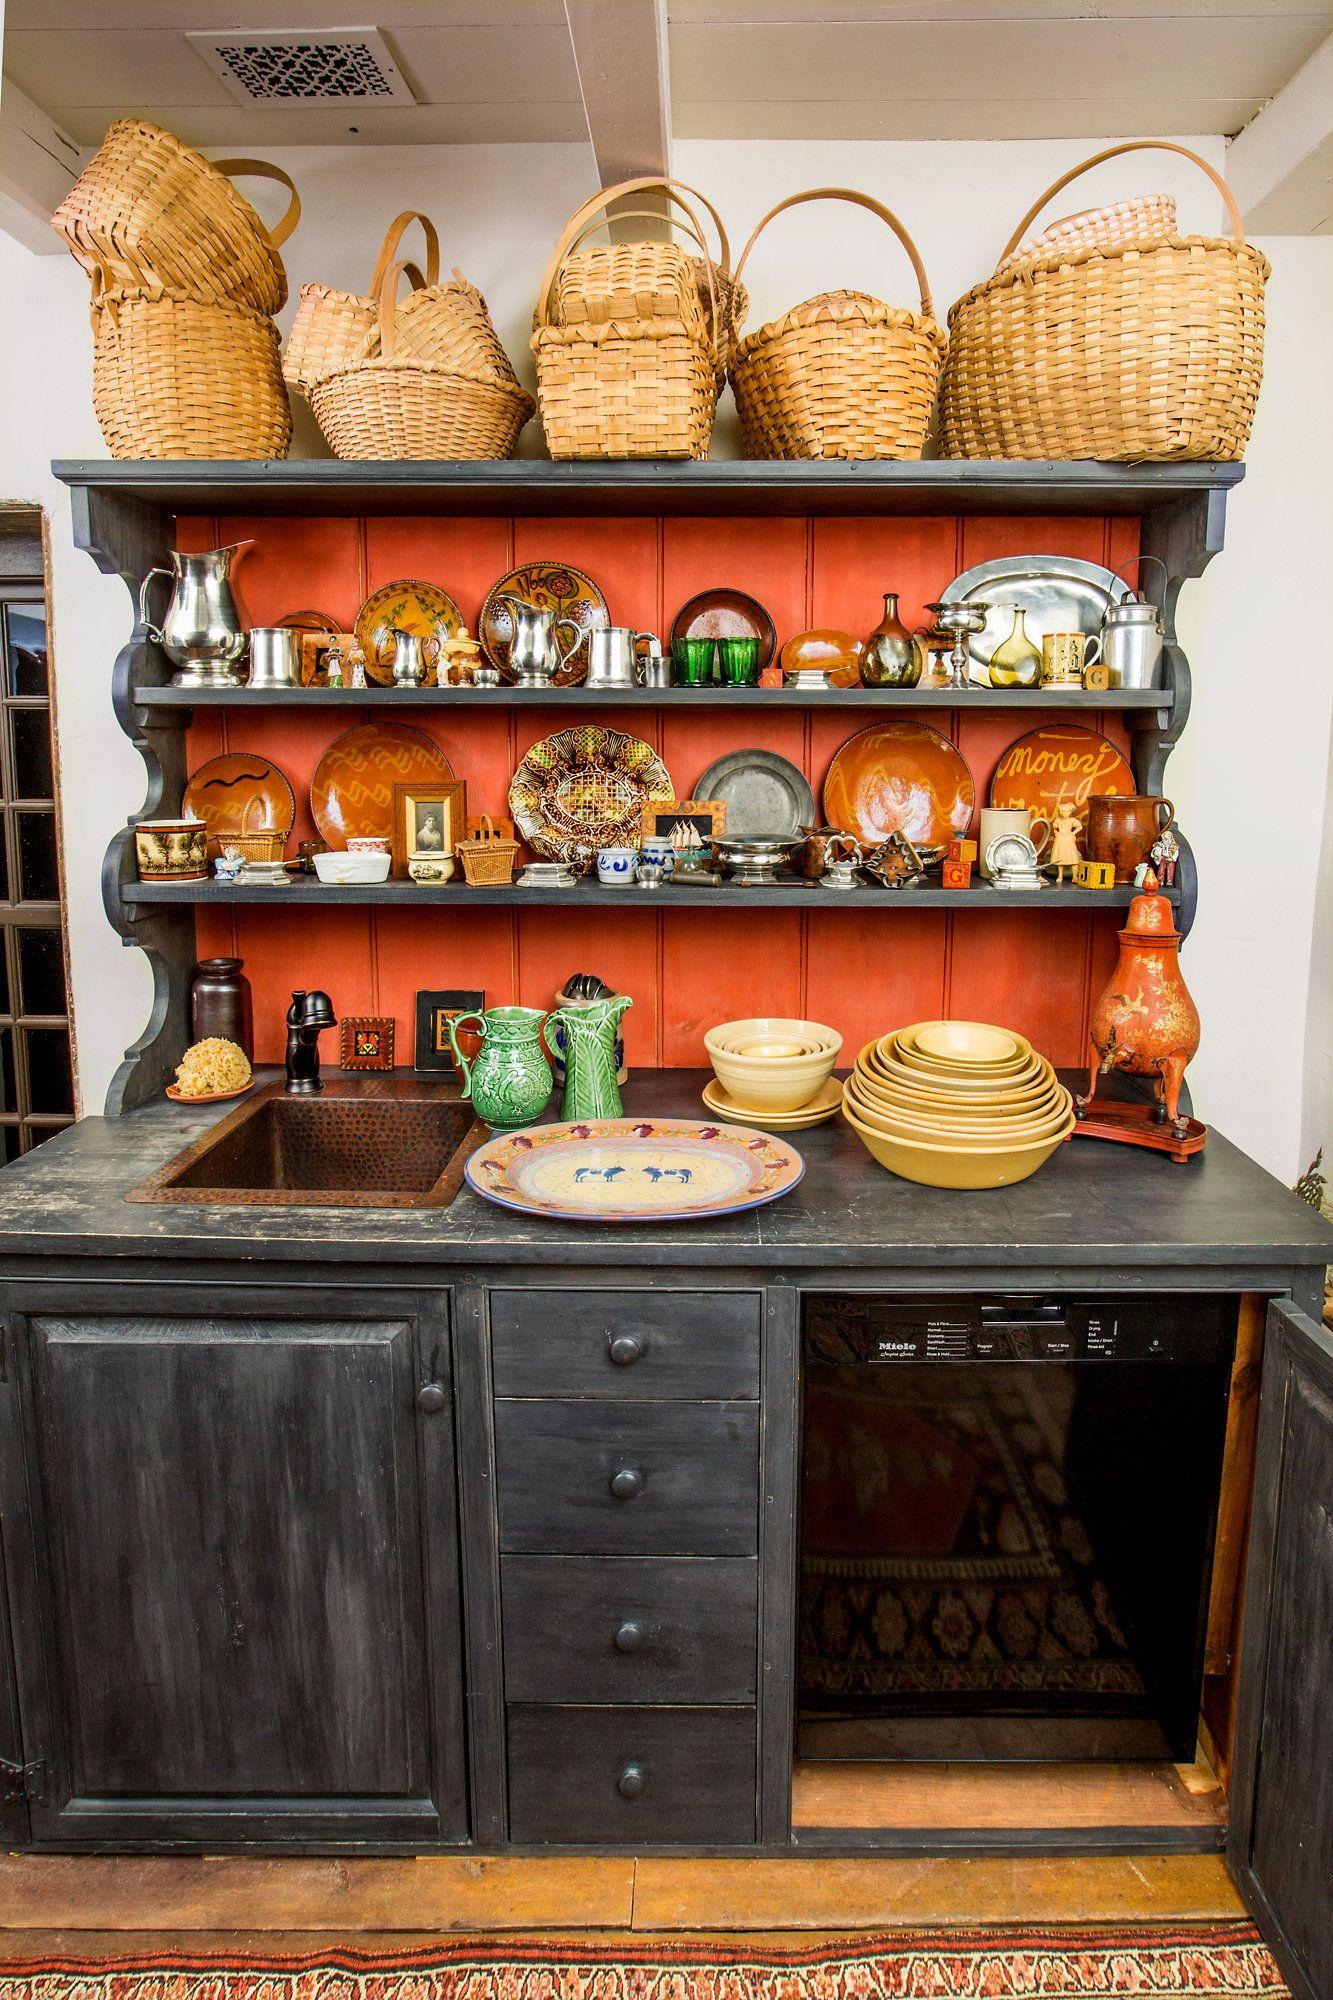 A periodappropriate cupboard in the stone house hides a